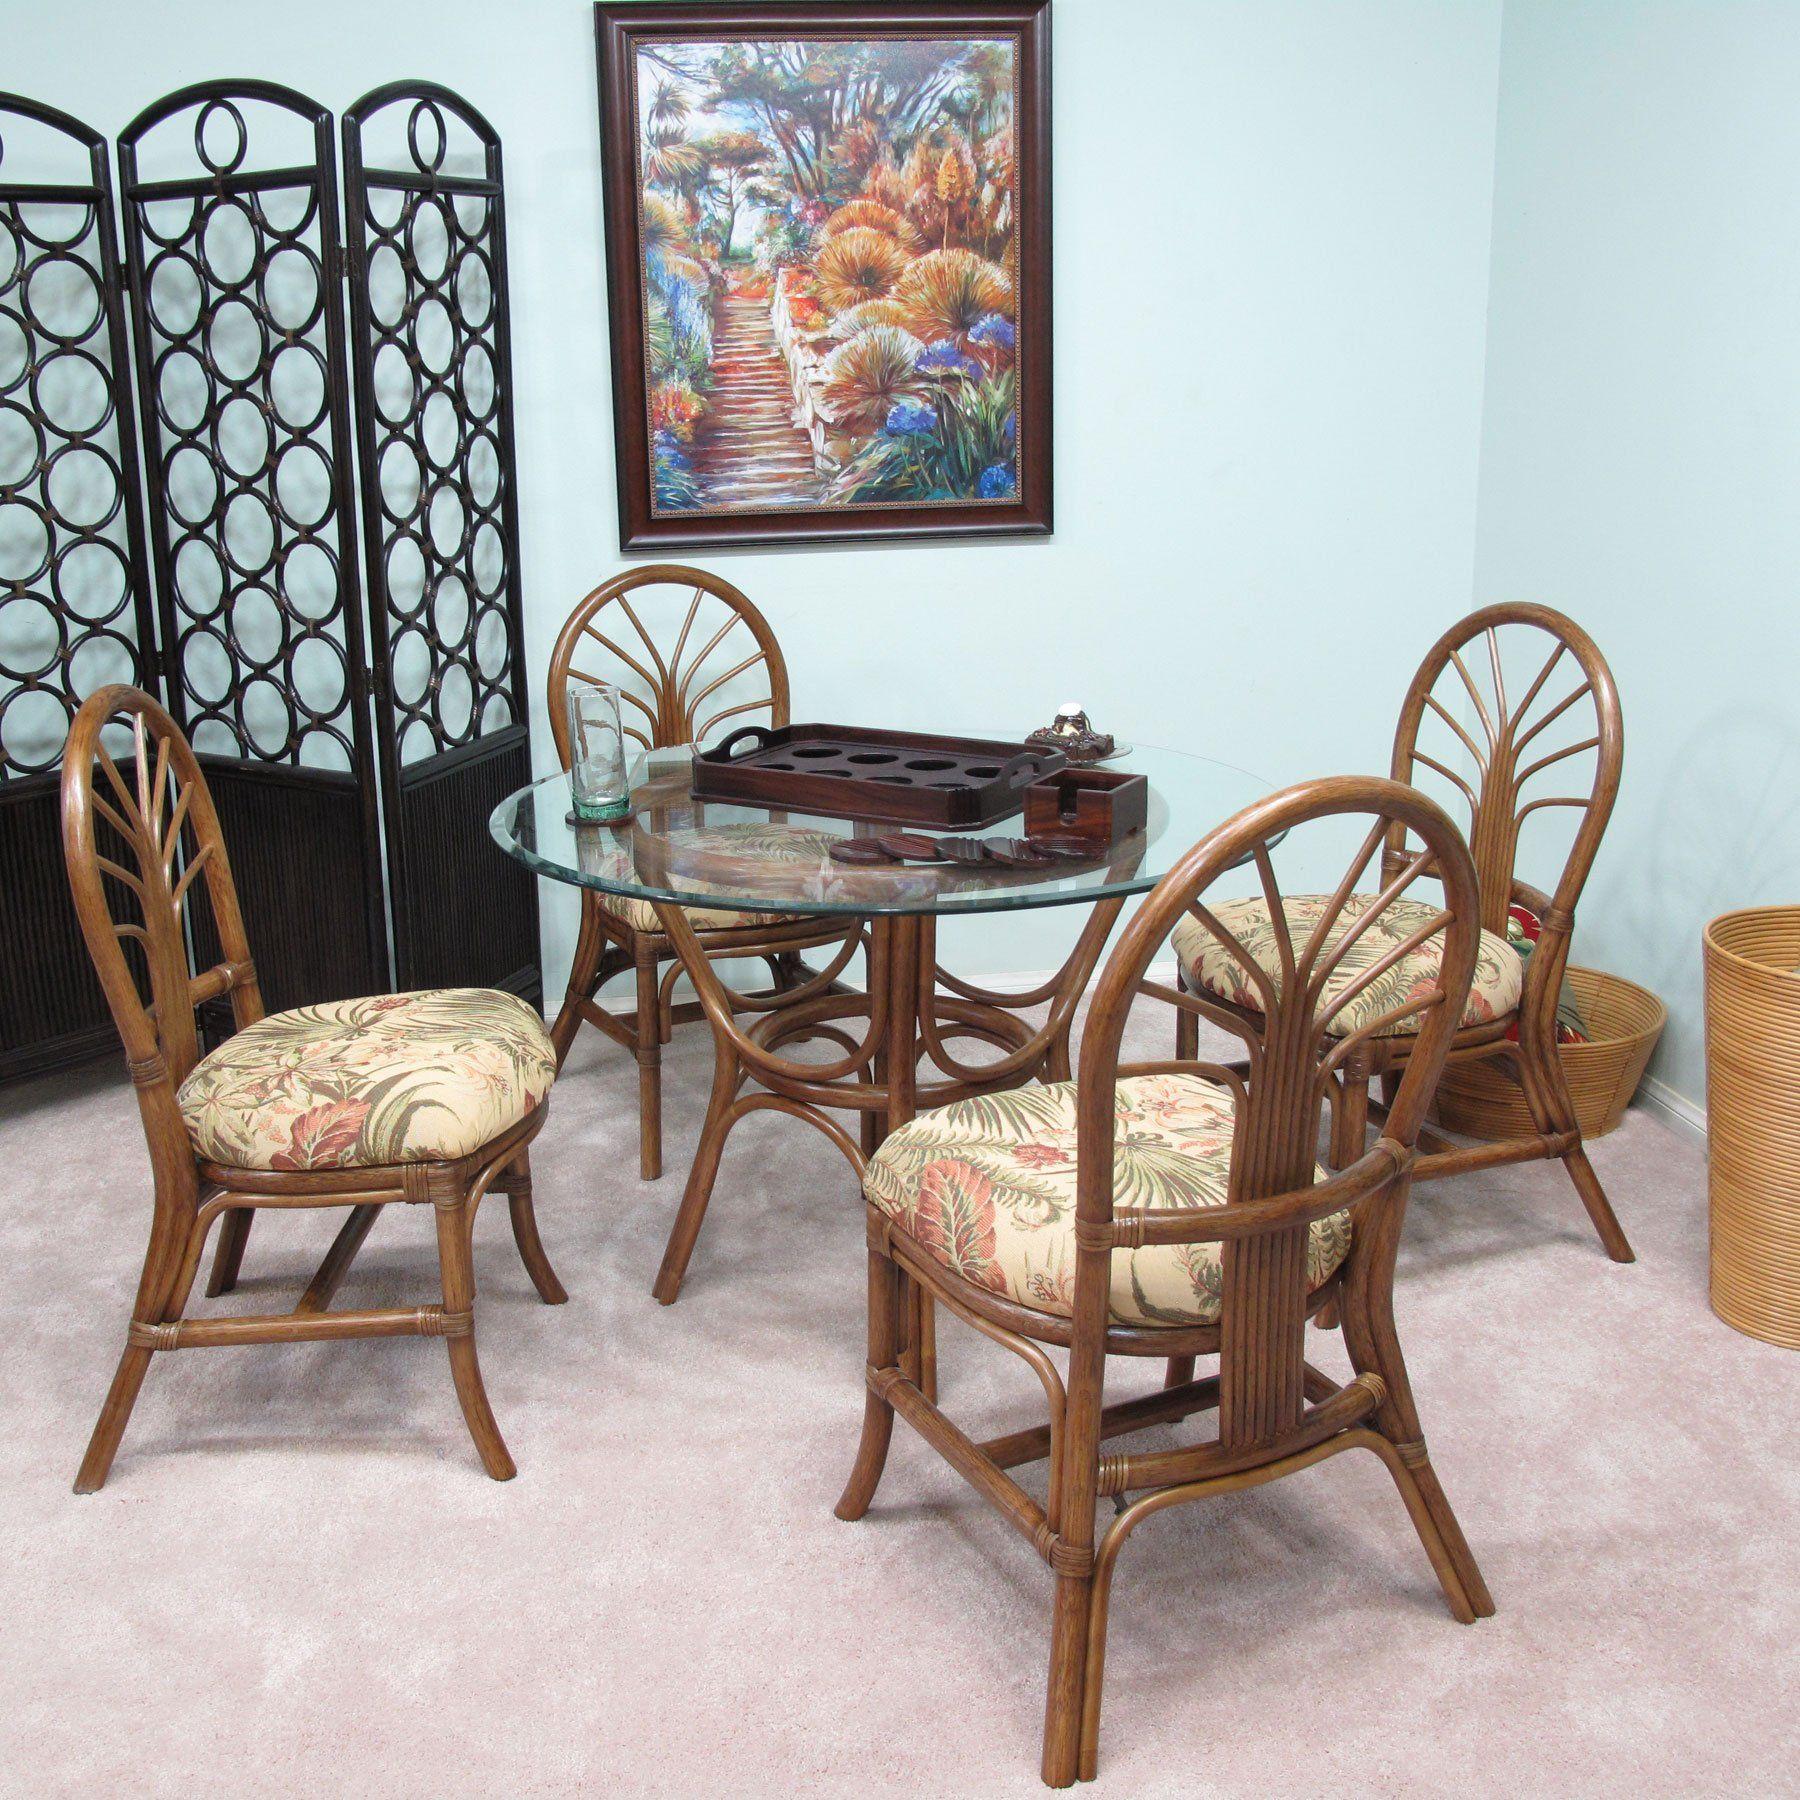 Premium Rattan Dining Furniture Sundance 5pc Set Panama Tropic